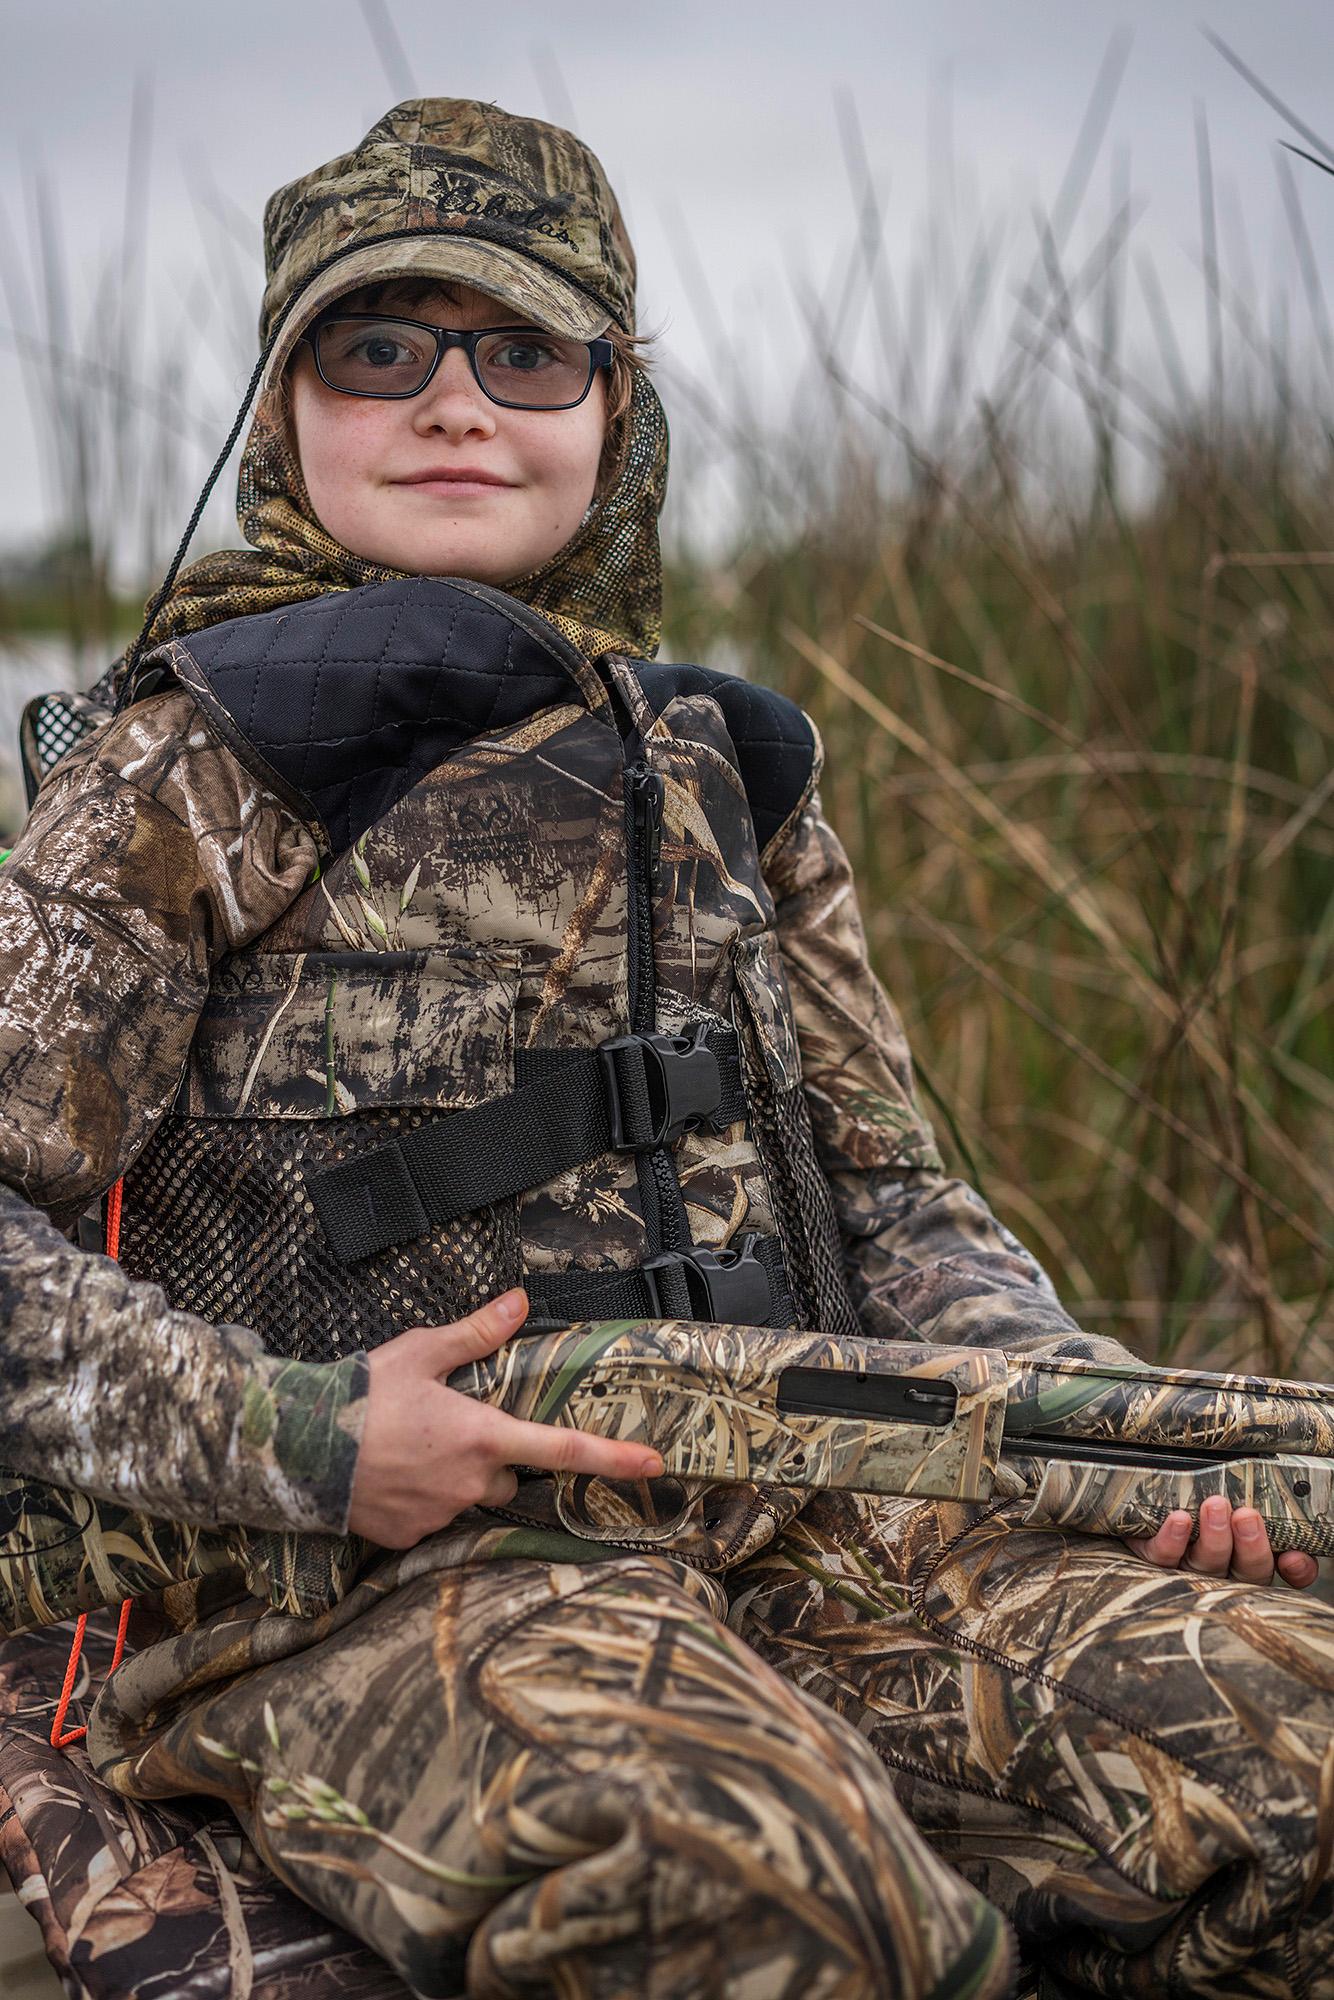 008_Peter_Essick-Duck_Hunter, near_Toledo_Ohio.jpg